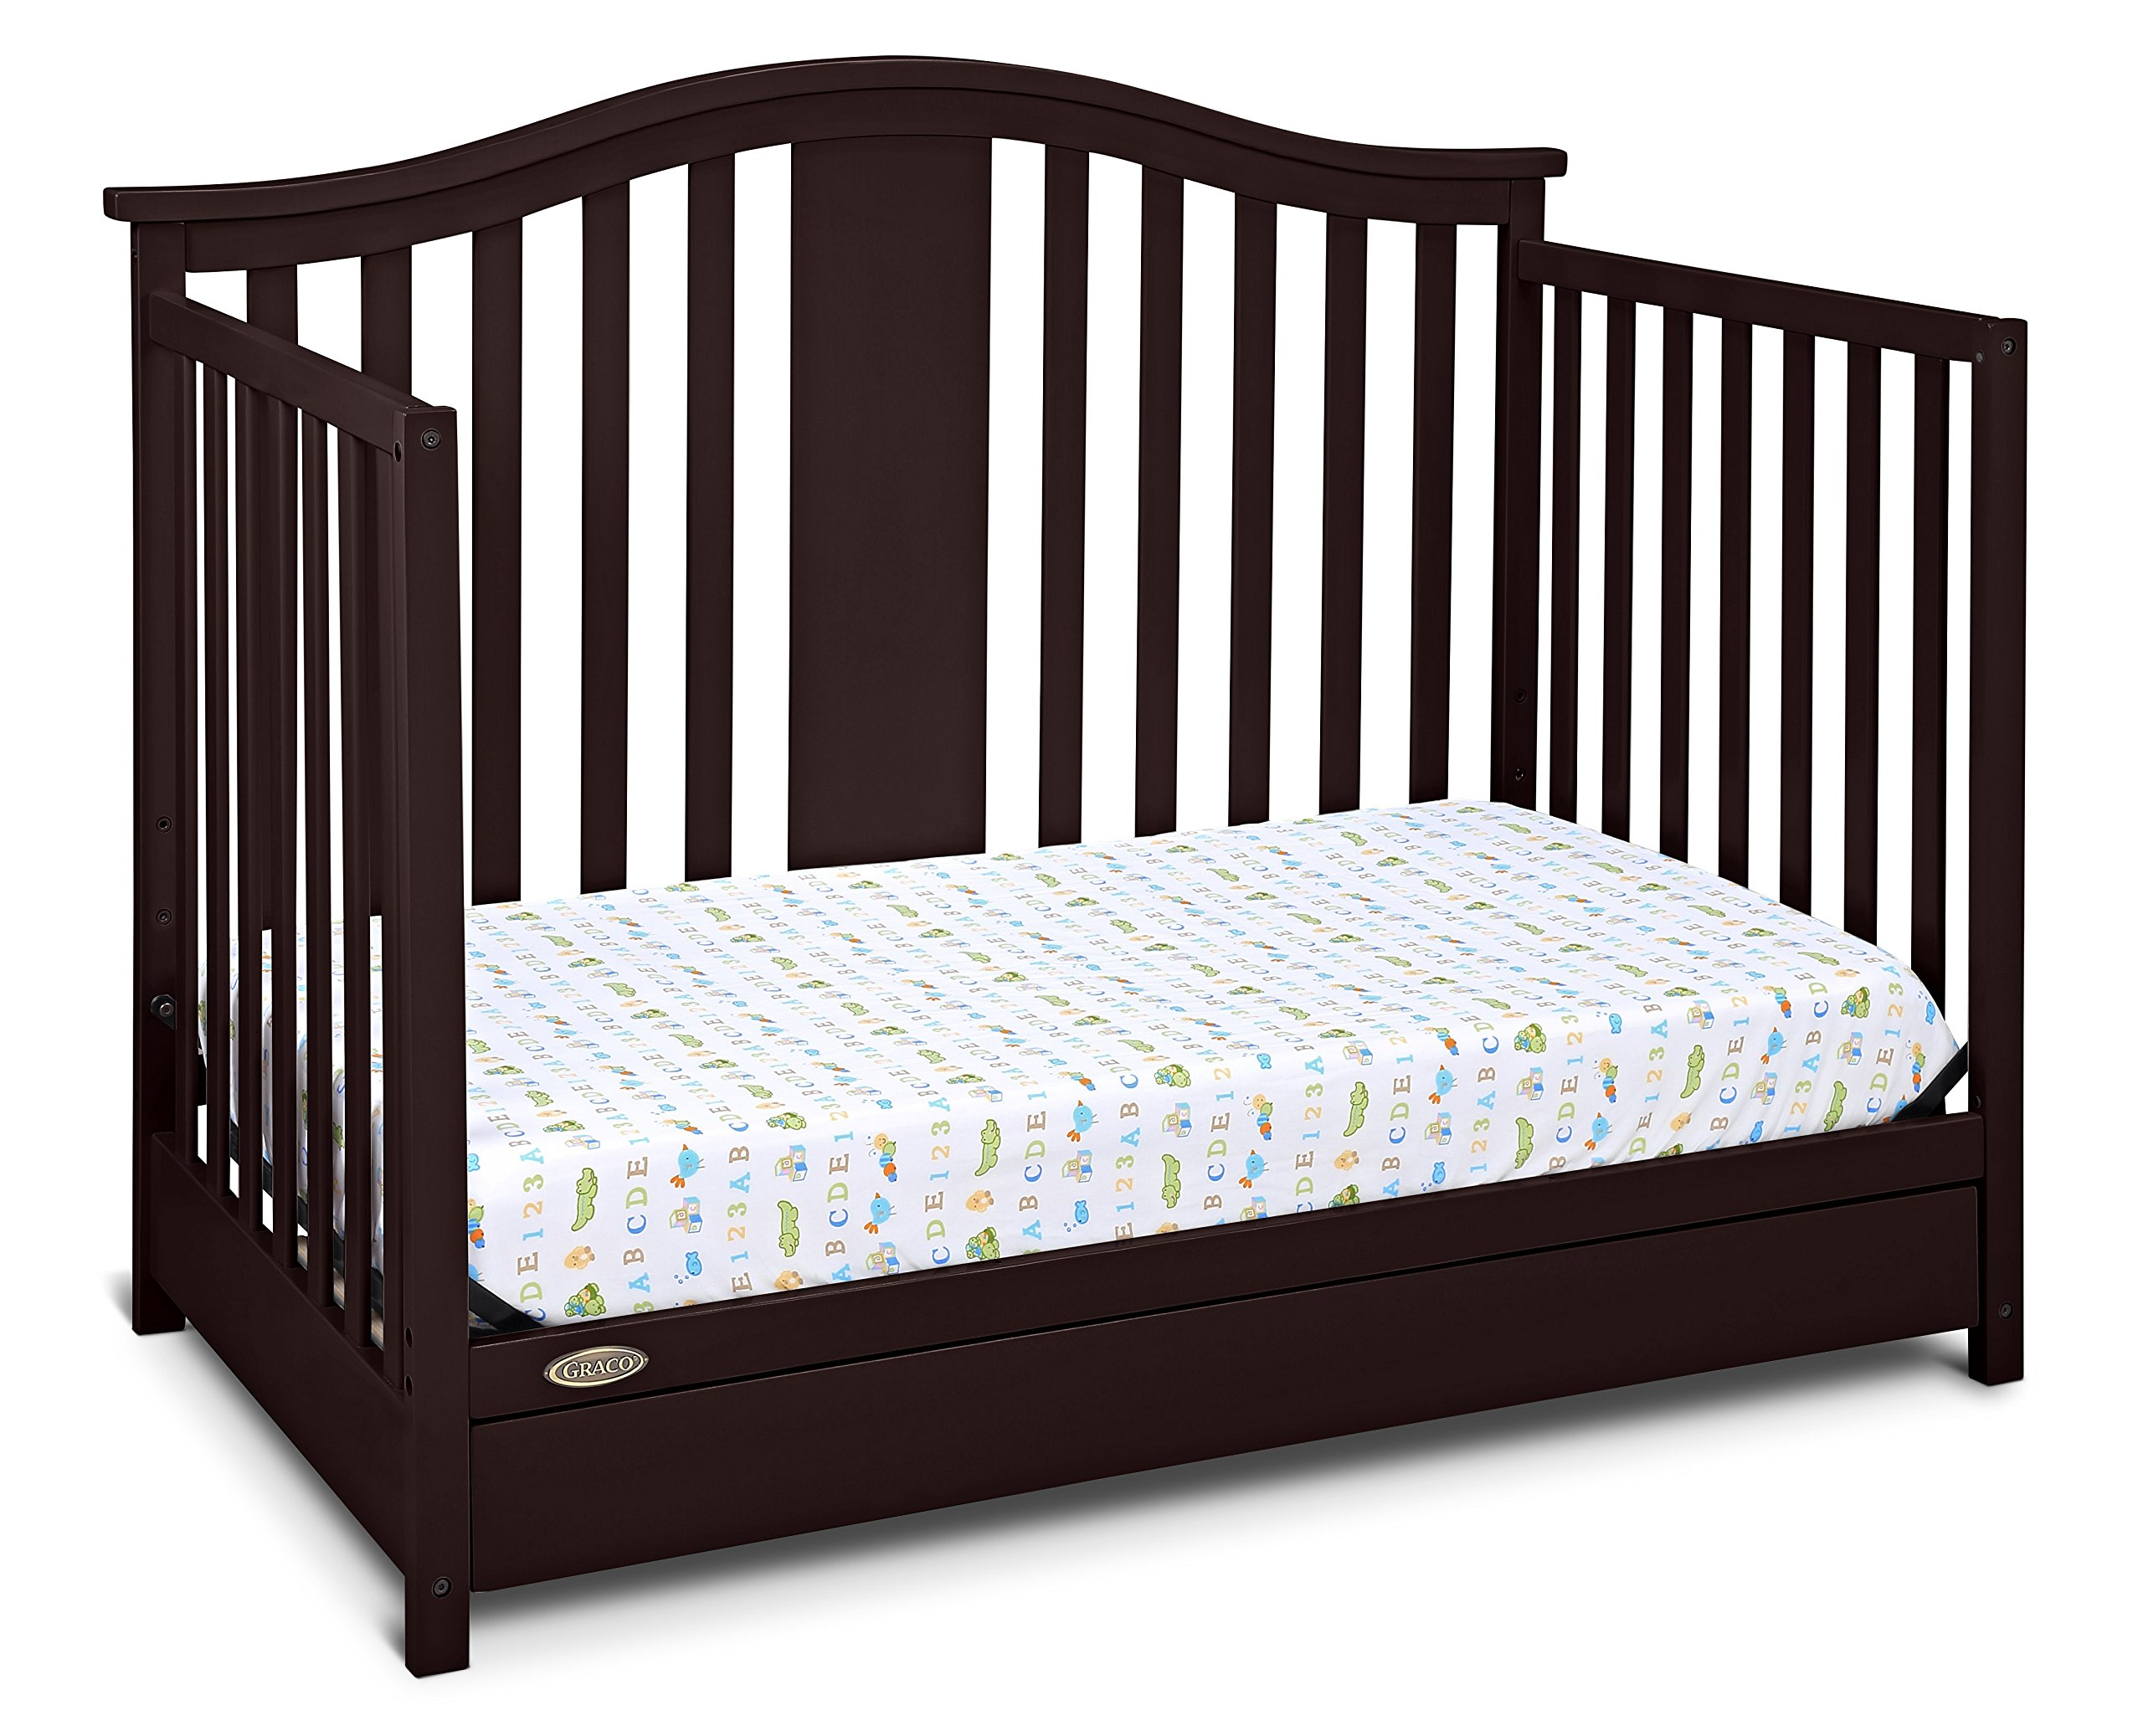 graco solano 4 in 1 convertible crib with drawer espresso 691039536921 ebay. Black Bedroom Furniture Sets. Home Design Ideas